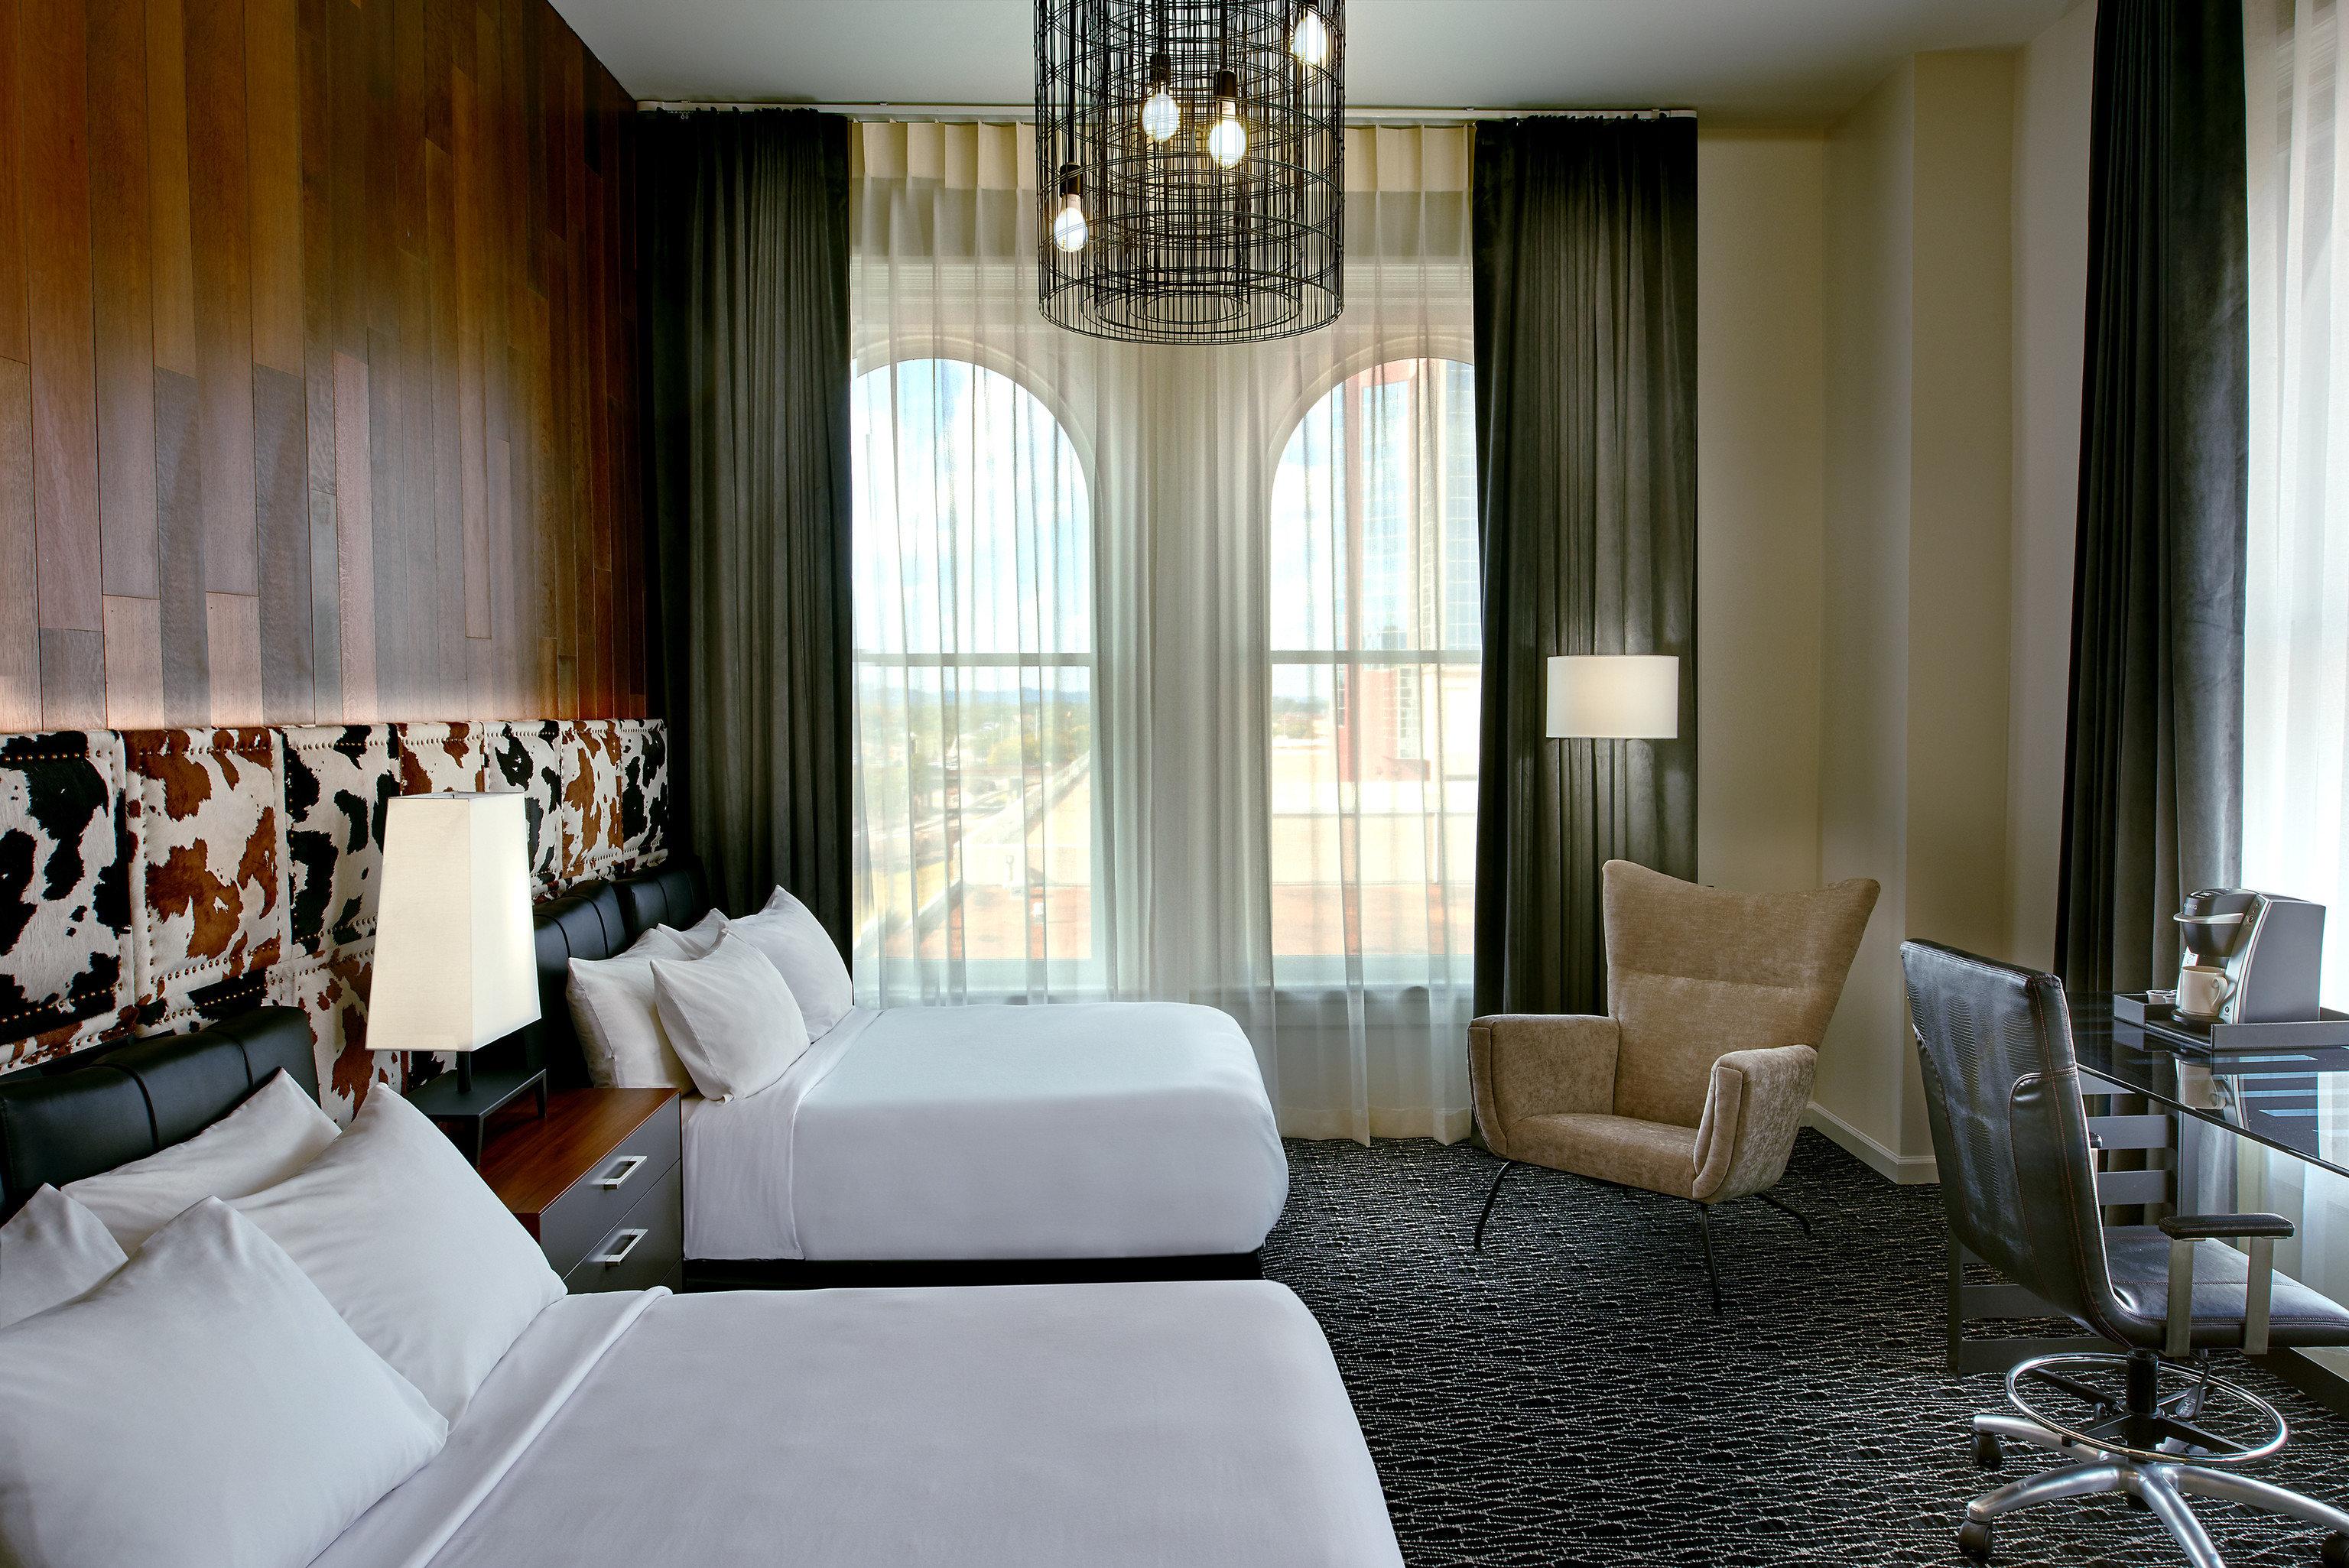 Boutique Hotels Trip Ideas Indoor Window Room Sofa Floor Property Living Bed Suite Interior